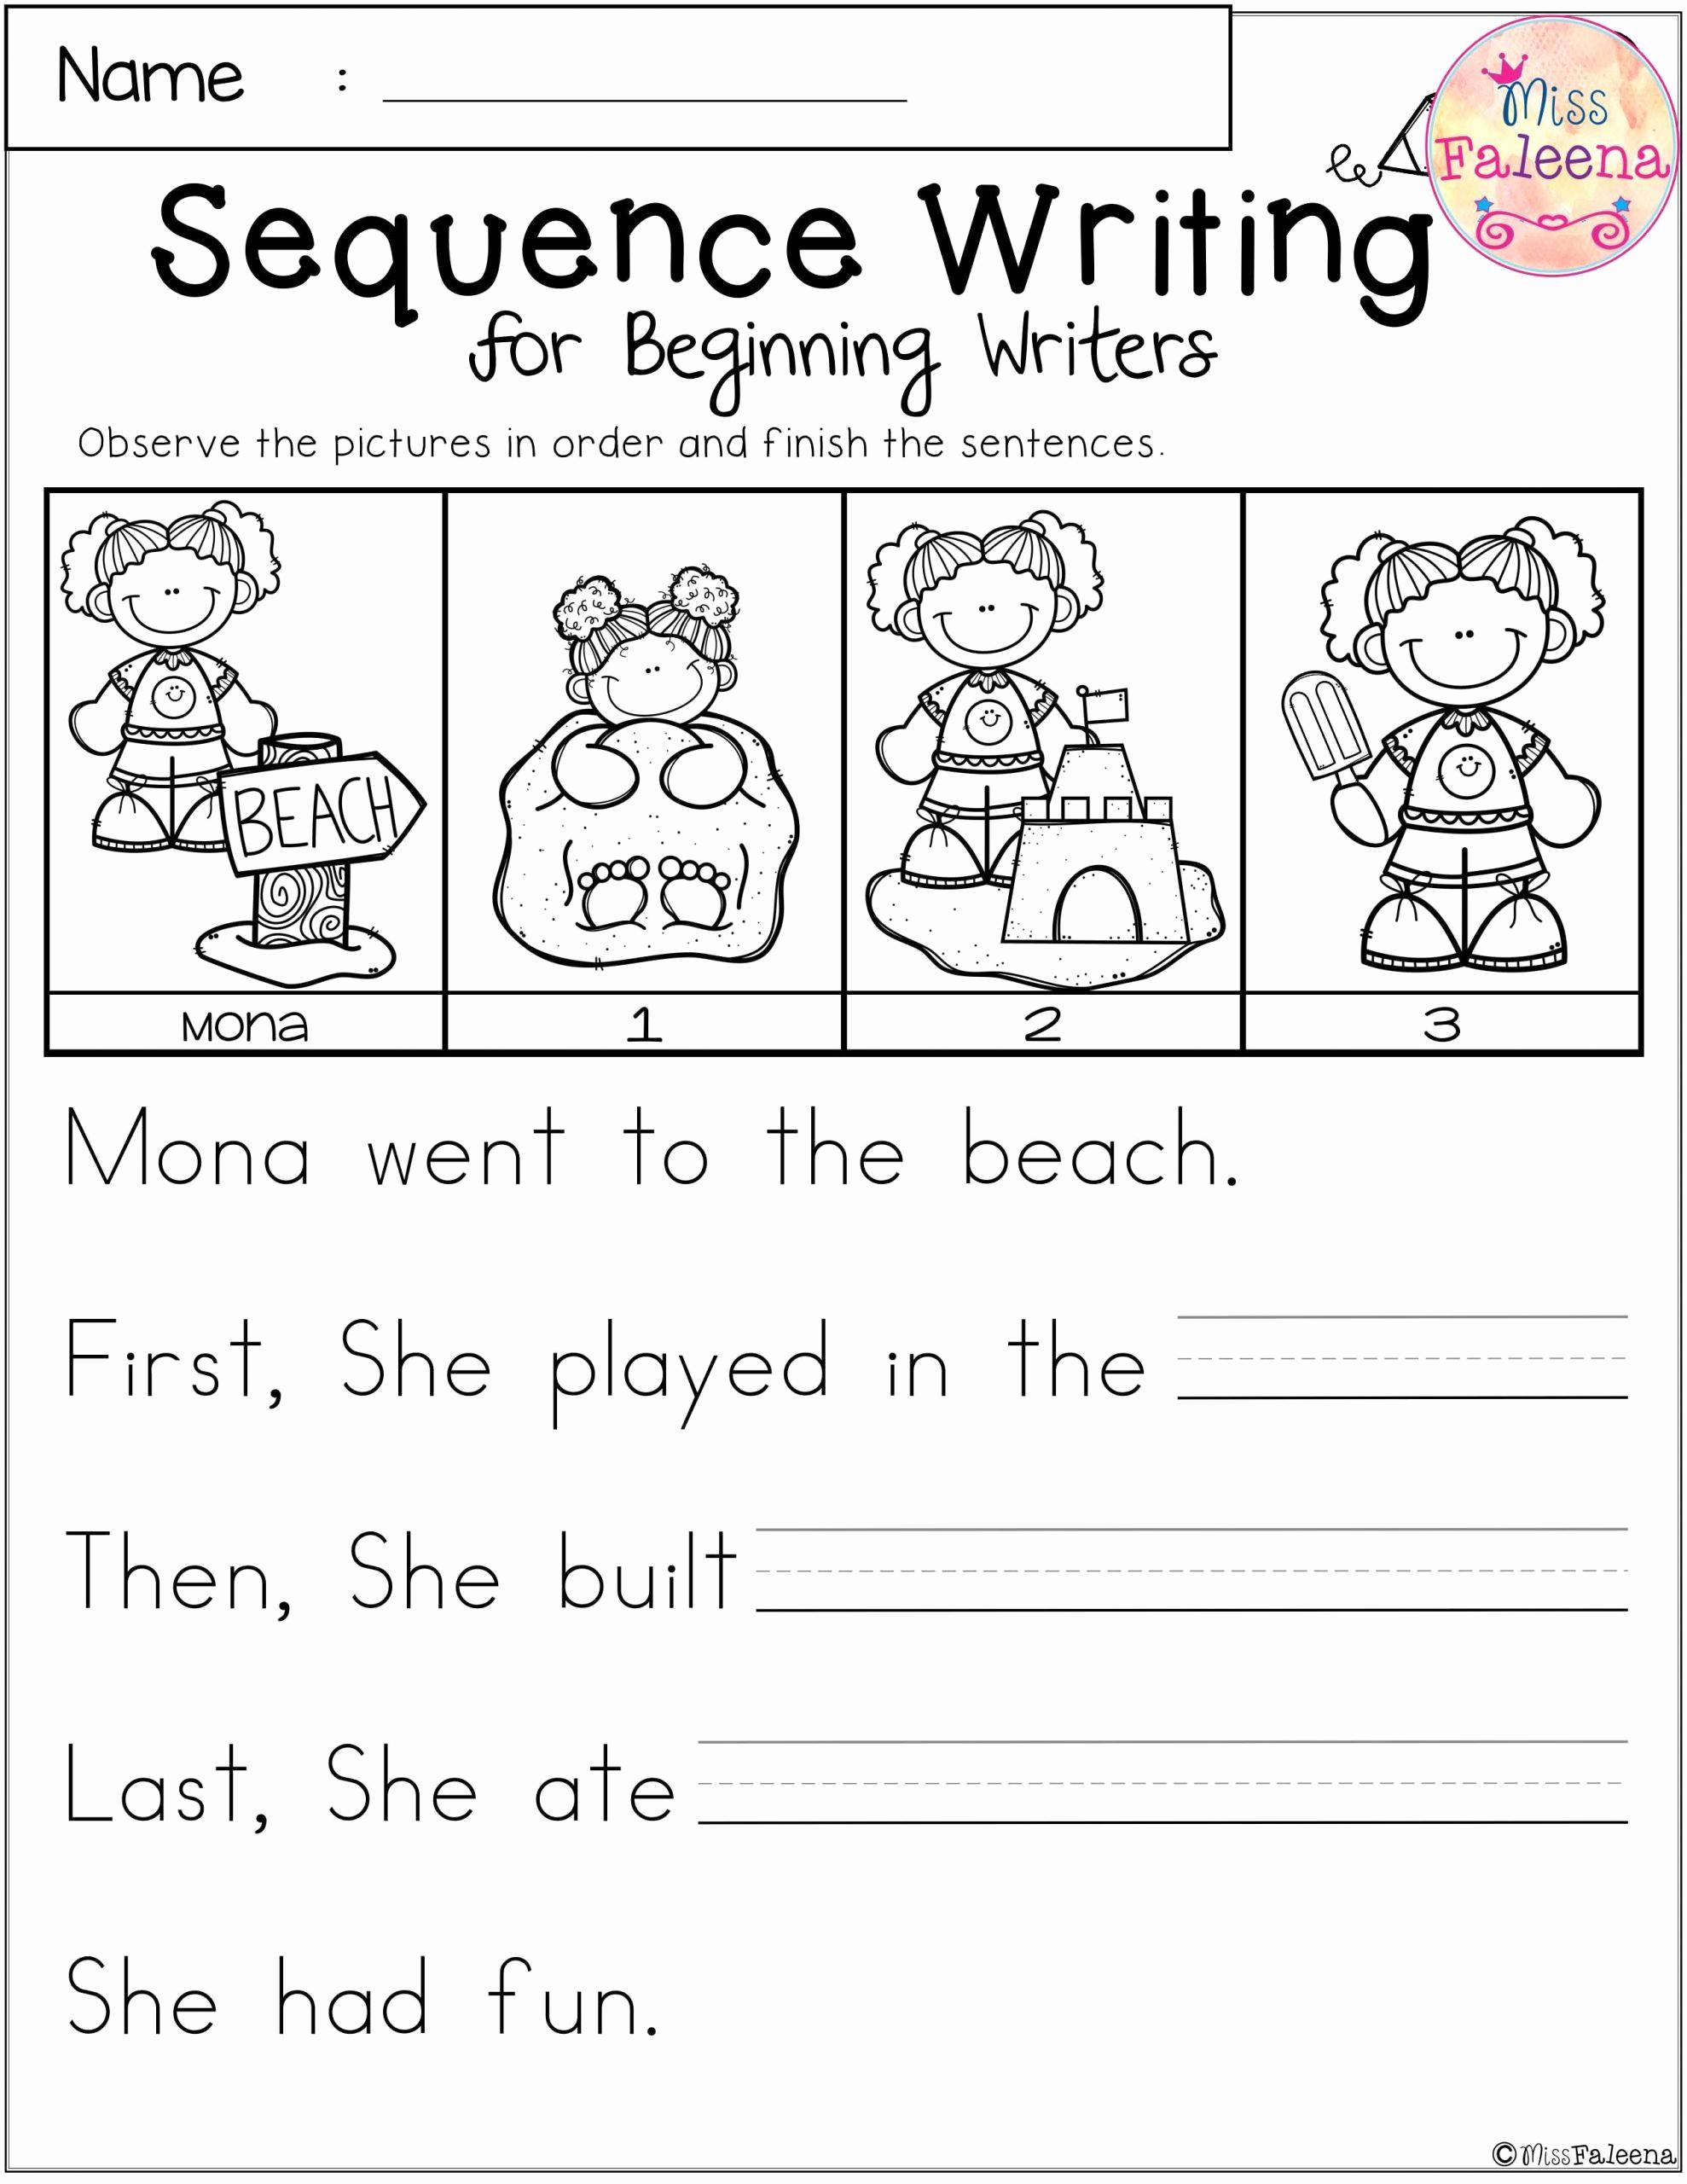 Printable Sequence Worksheets Luxury 20 Sequencing Worksheets for Kindergarten